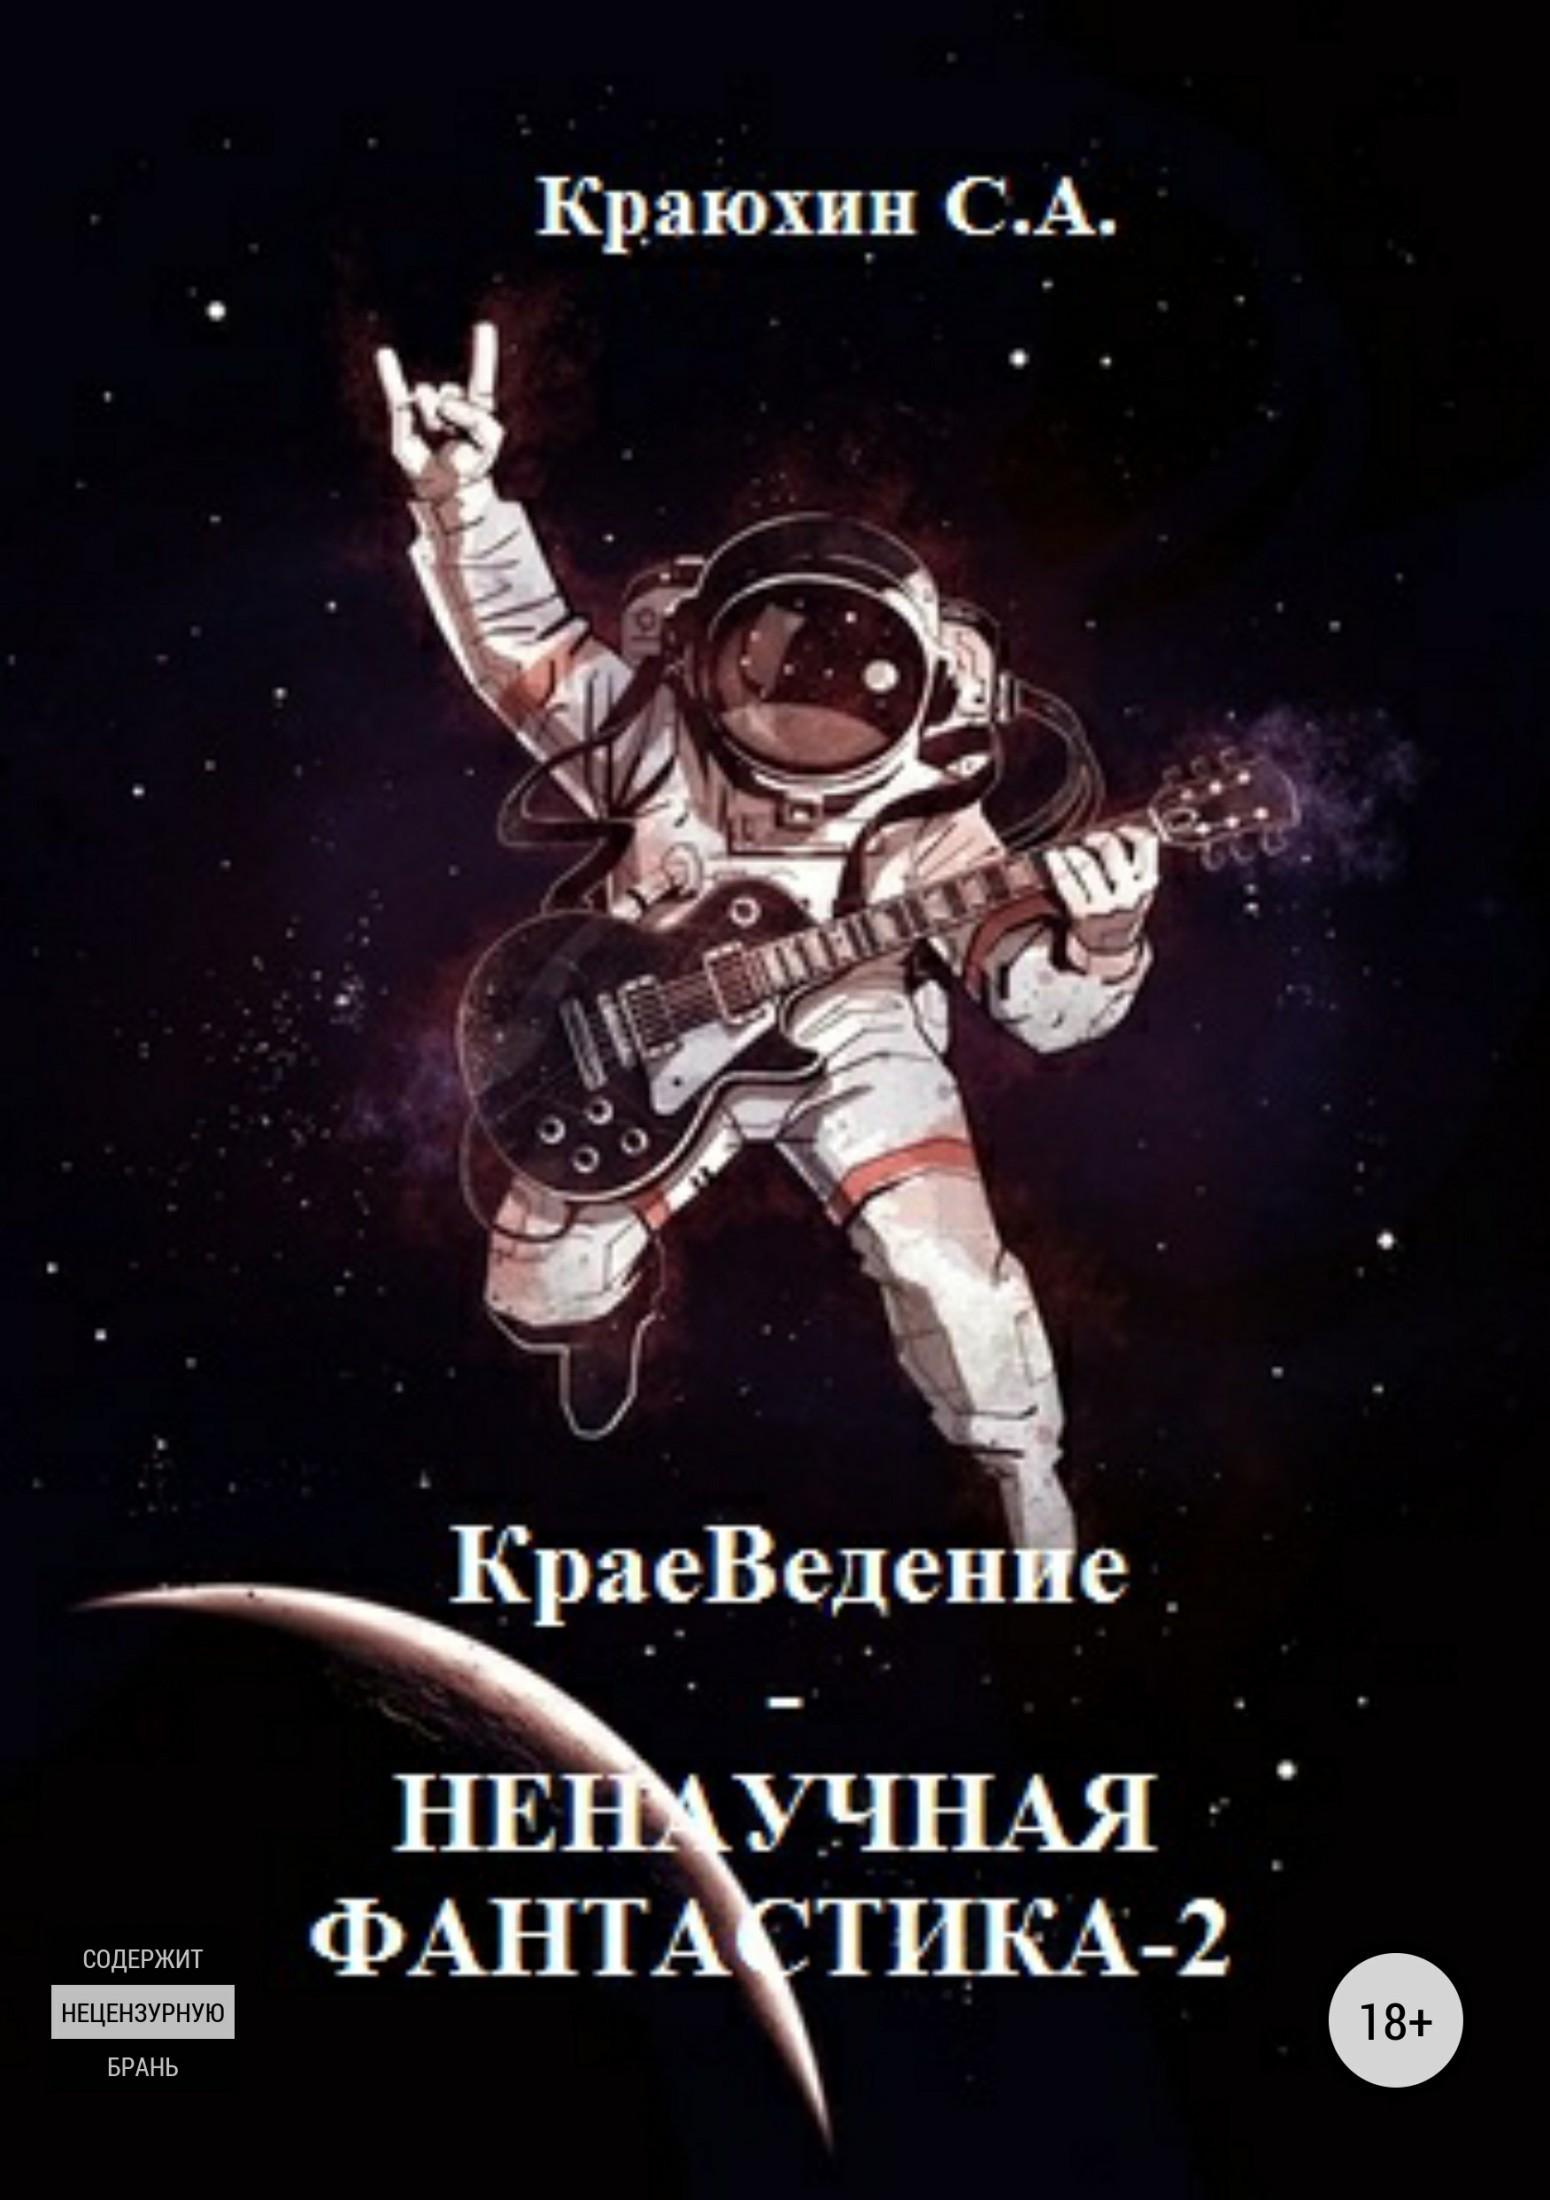 Сергей Александрович Краюхин КраеВедение! Ненаучная фантастика 2 сергей александрович краюхин крайняя поэзия